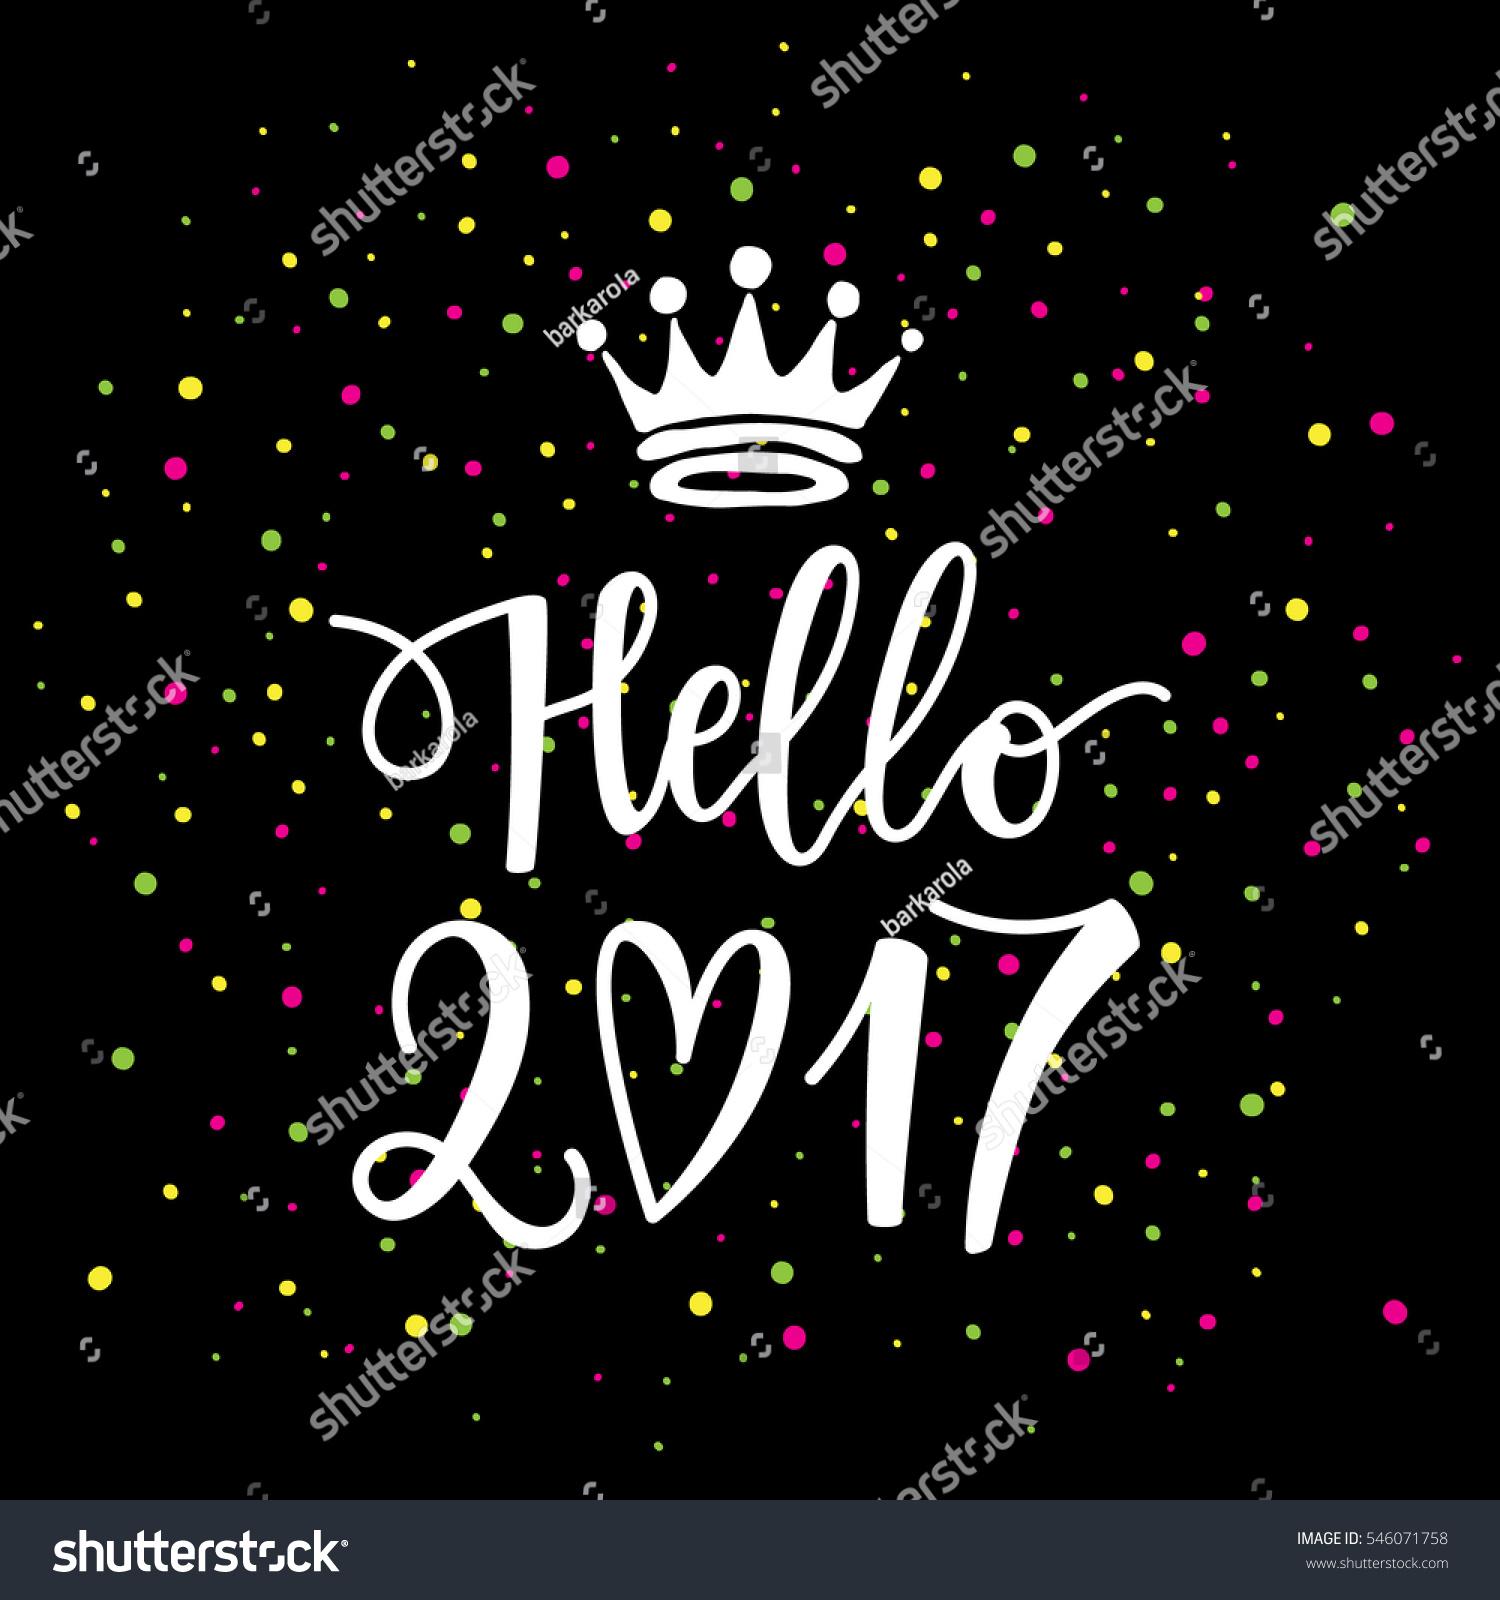 vector hand drawn hello phrase stock vector  vector hand drawn hello 2017 phrase a crown new year card holiday poster